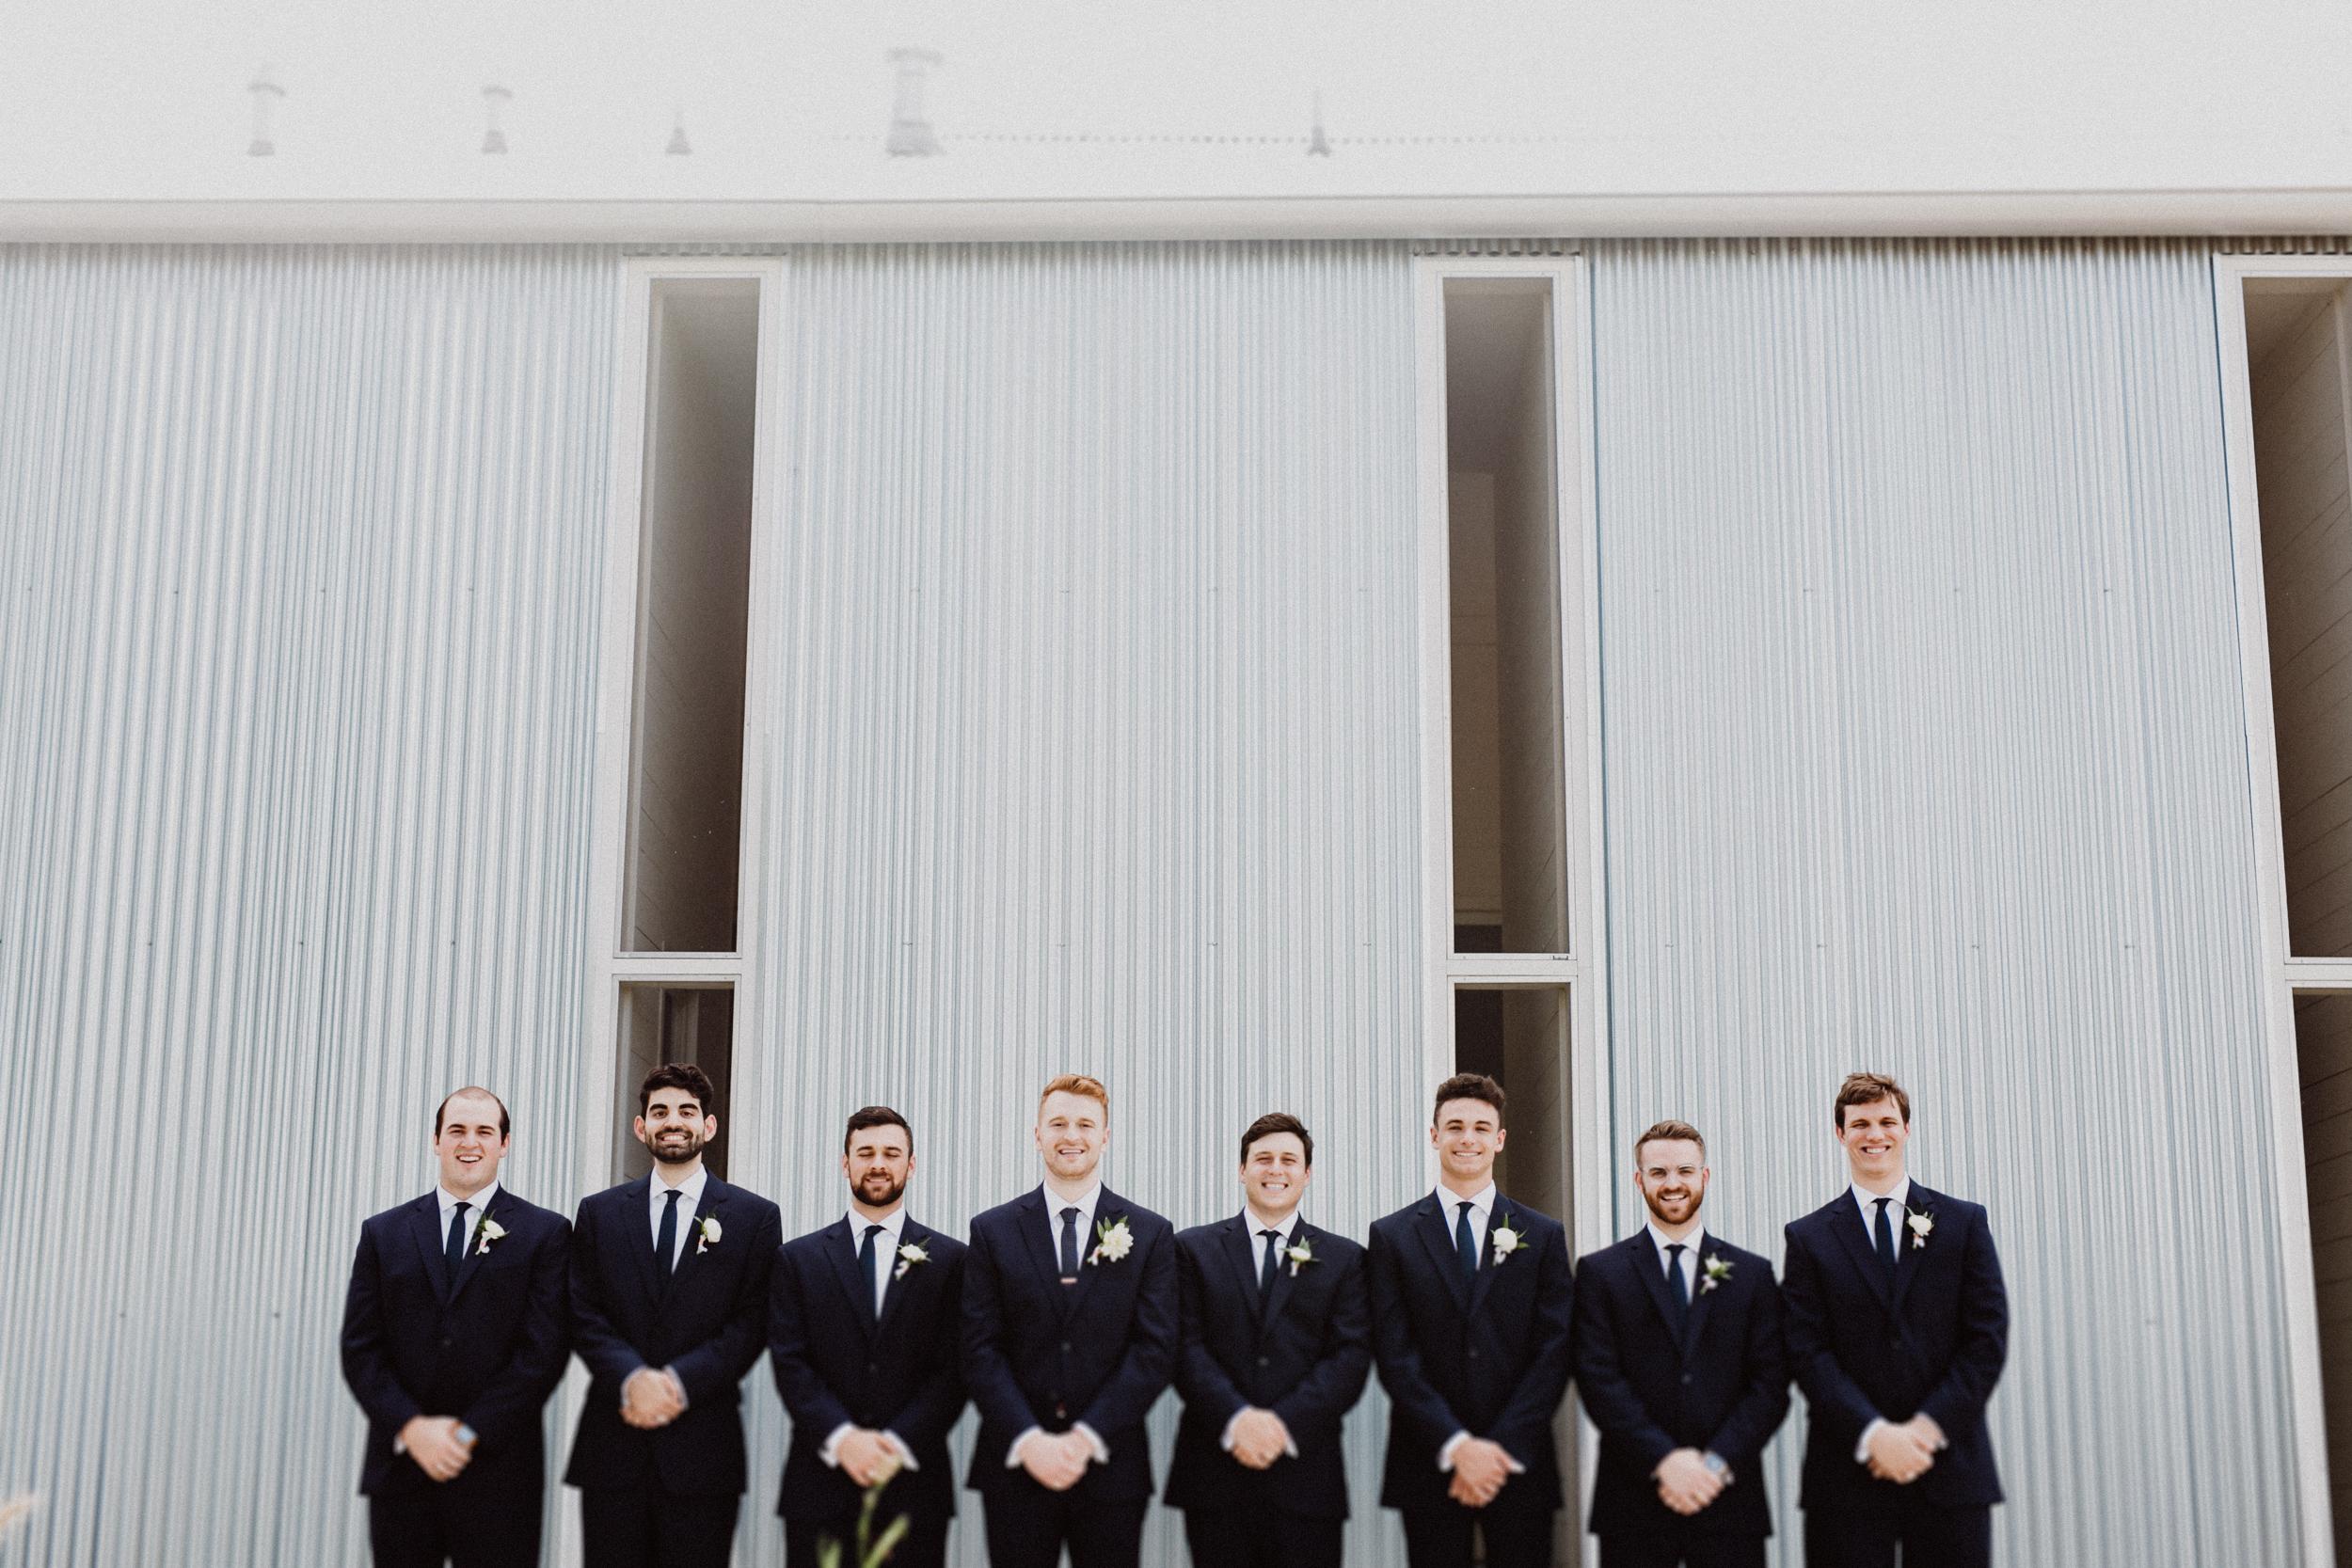 prospect-house-wedding-S&AC-432.jpg